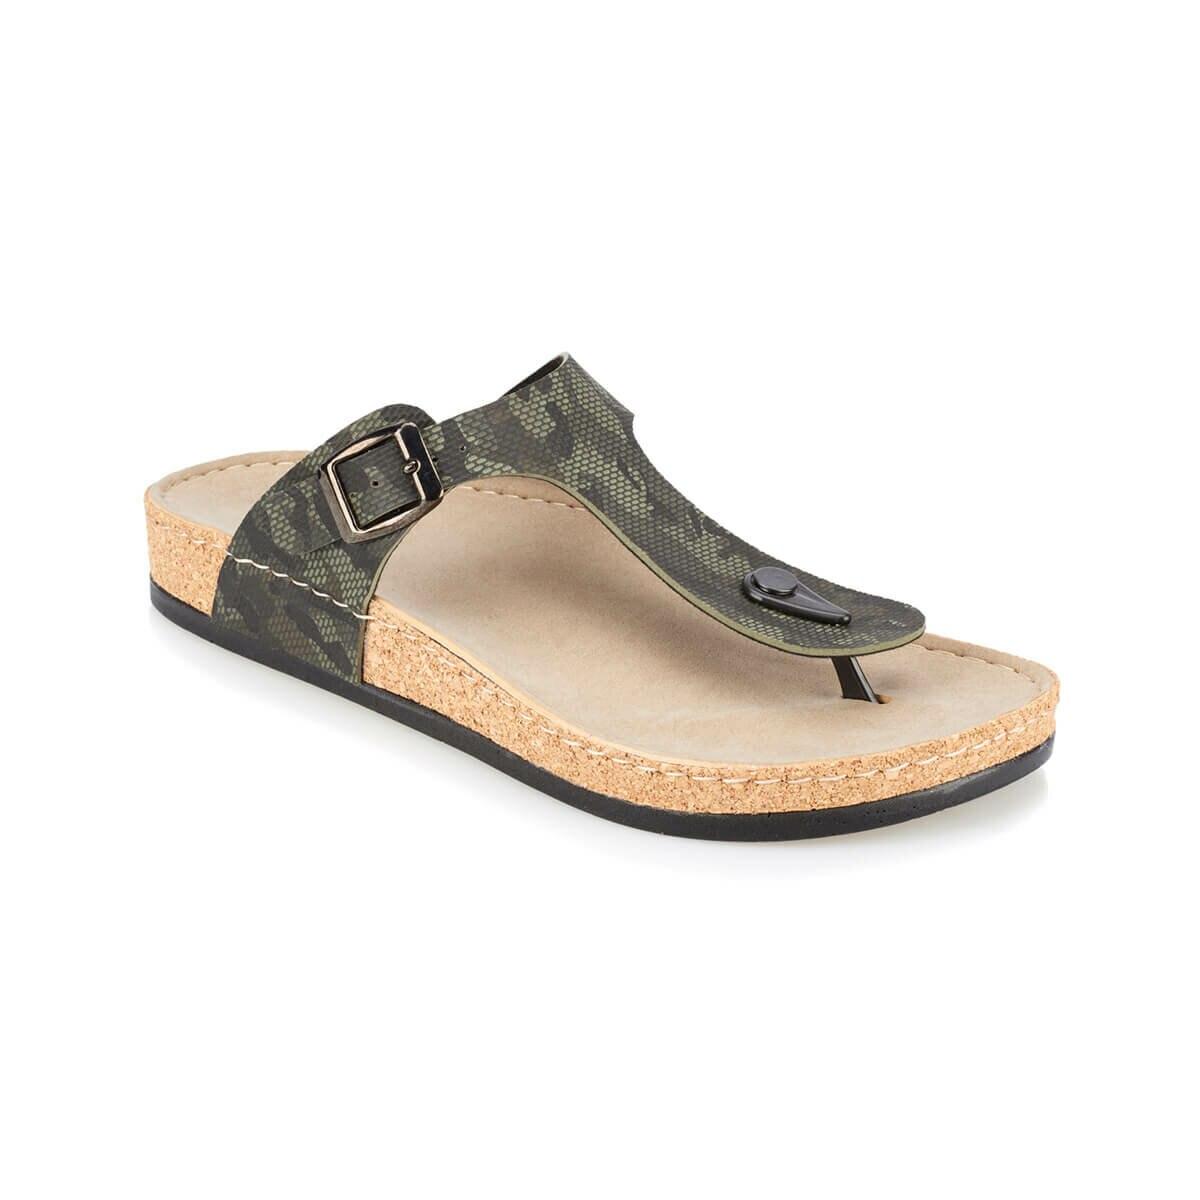 FLO GUSTO Khaki Male Slippers KINETIX